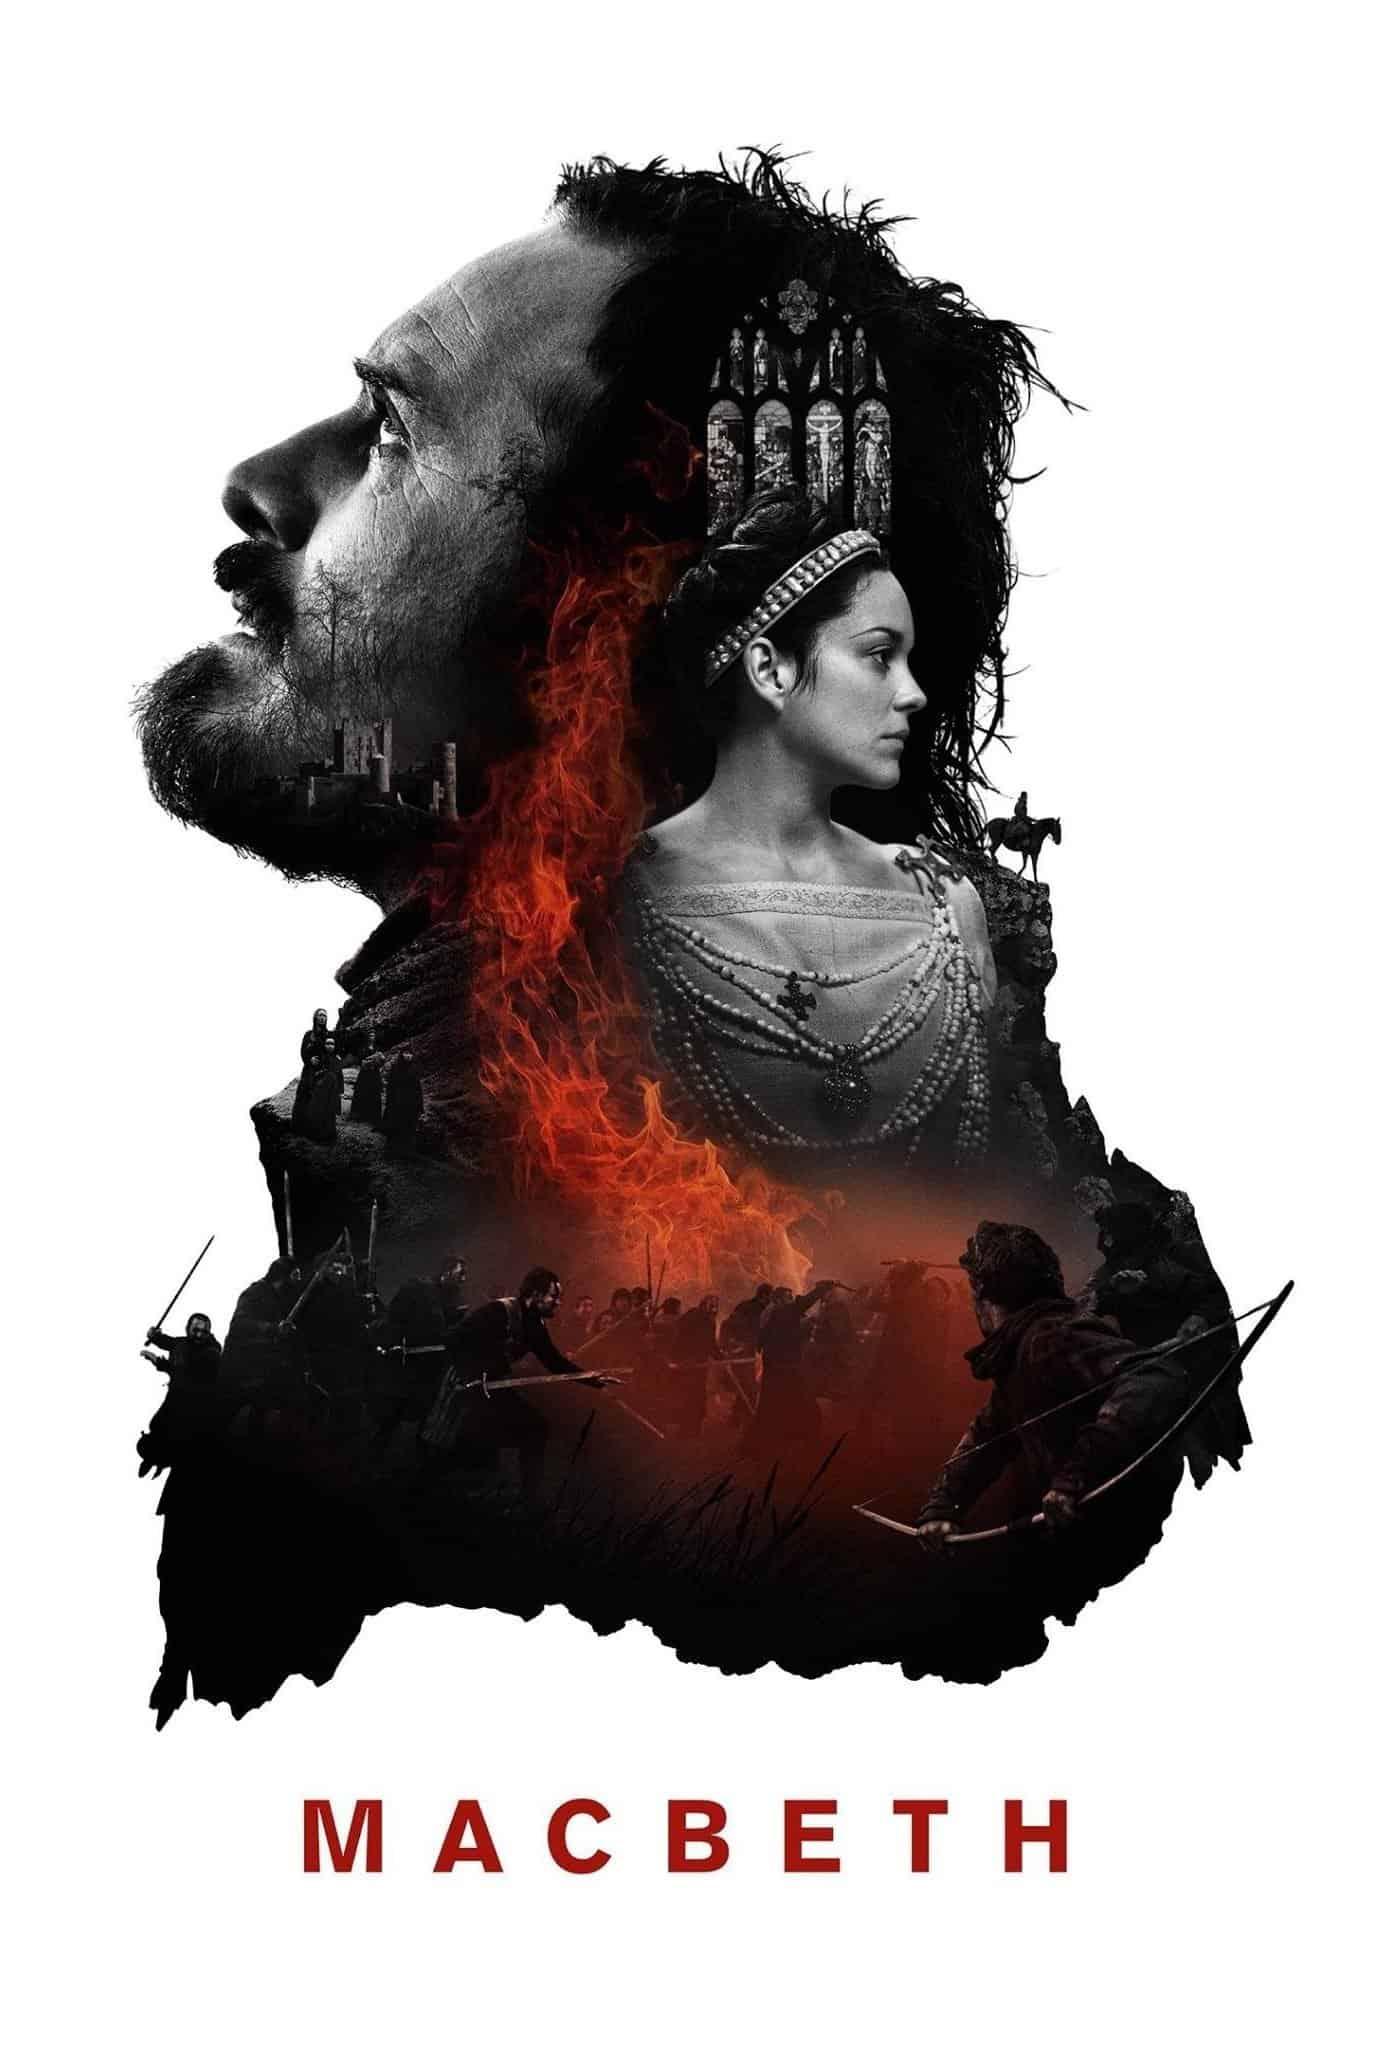 Macbeth, 2015